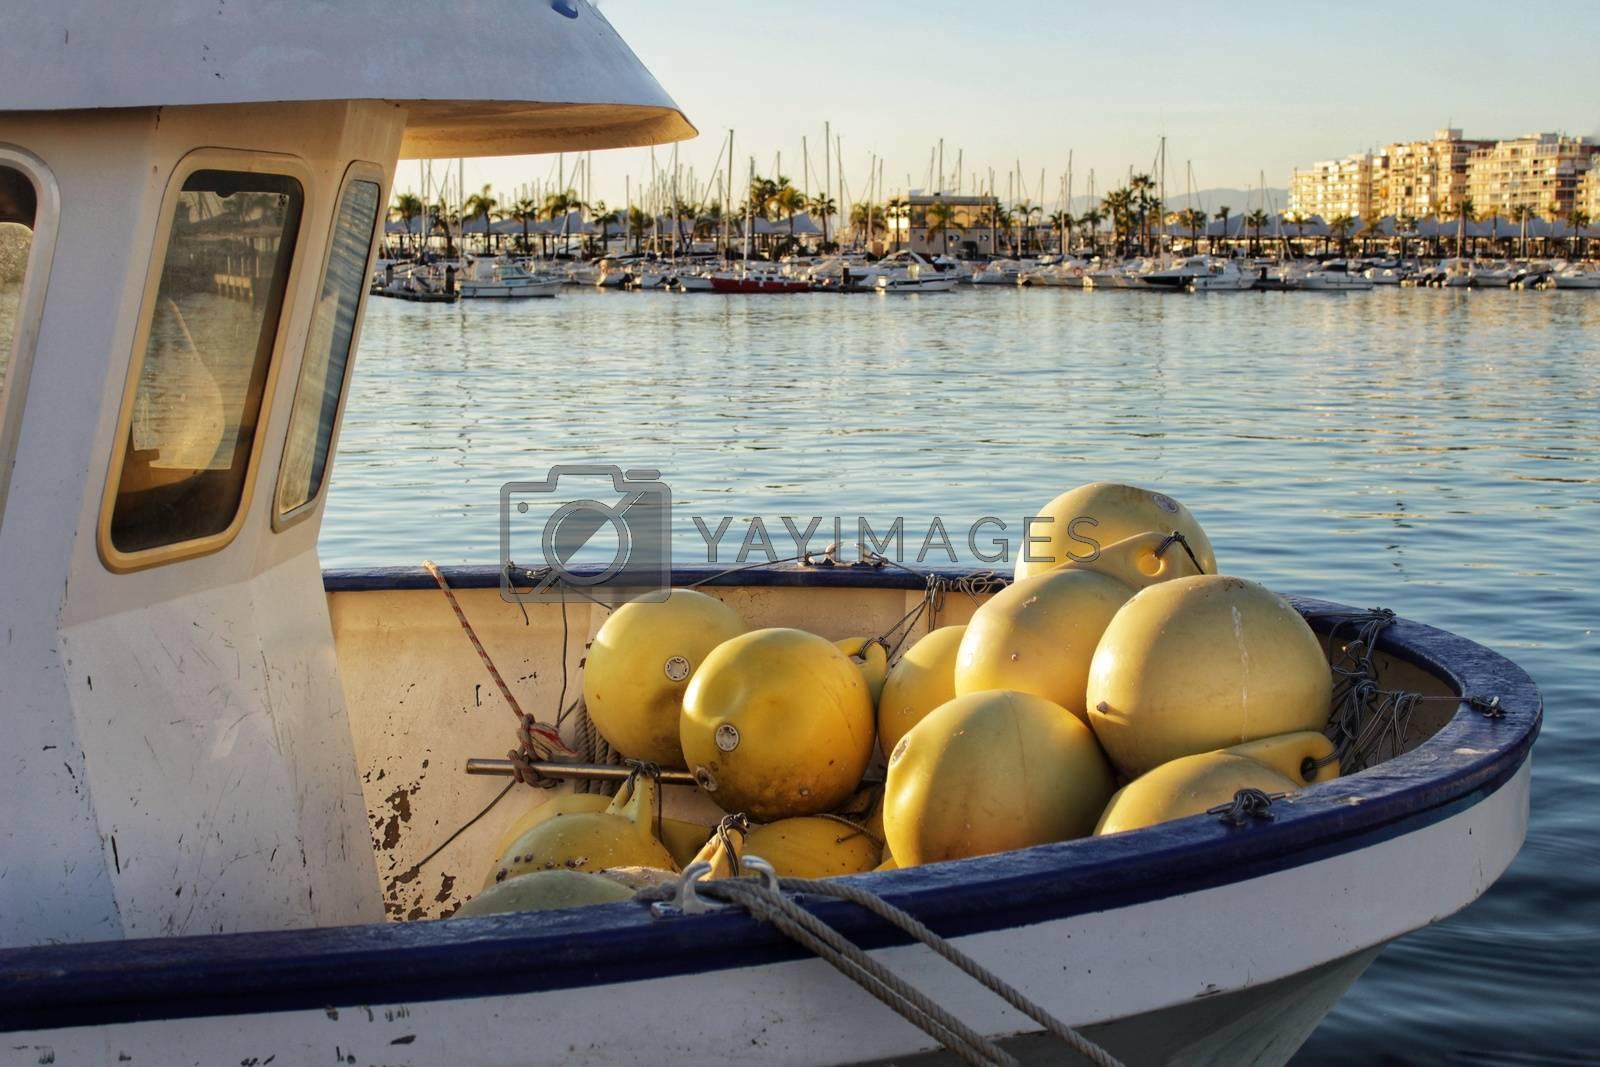 Boats moored in the port of Santa Pola, Alicante. Spain.